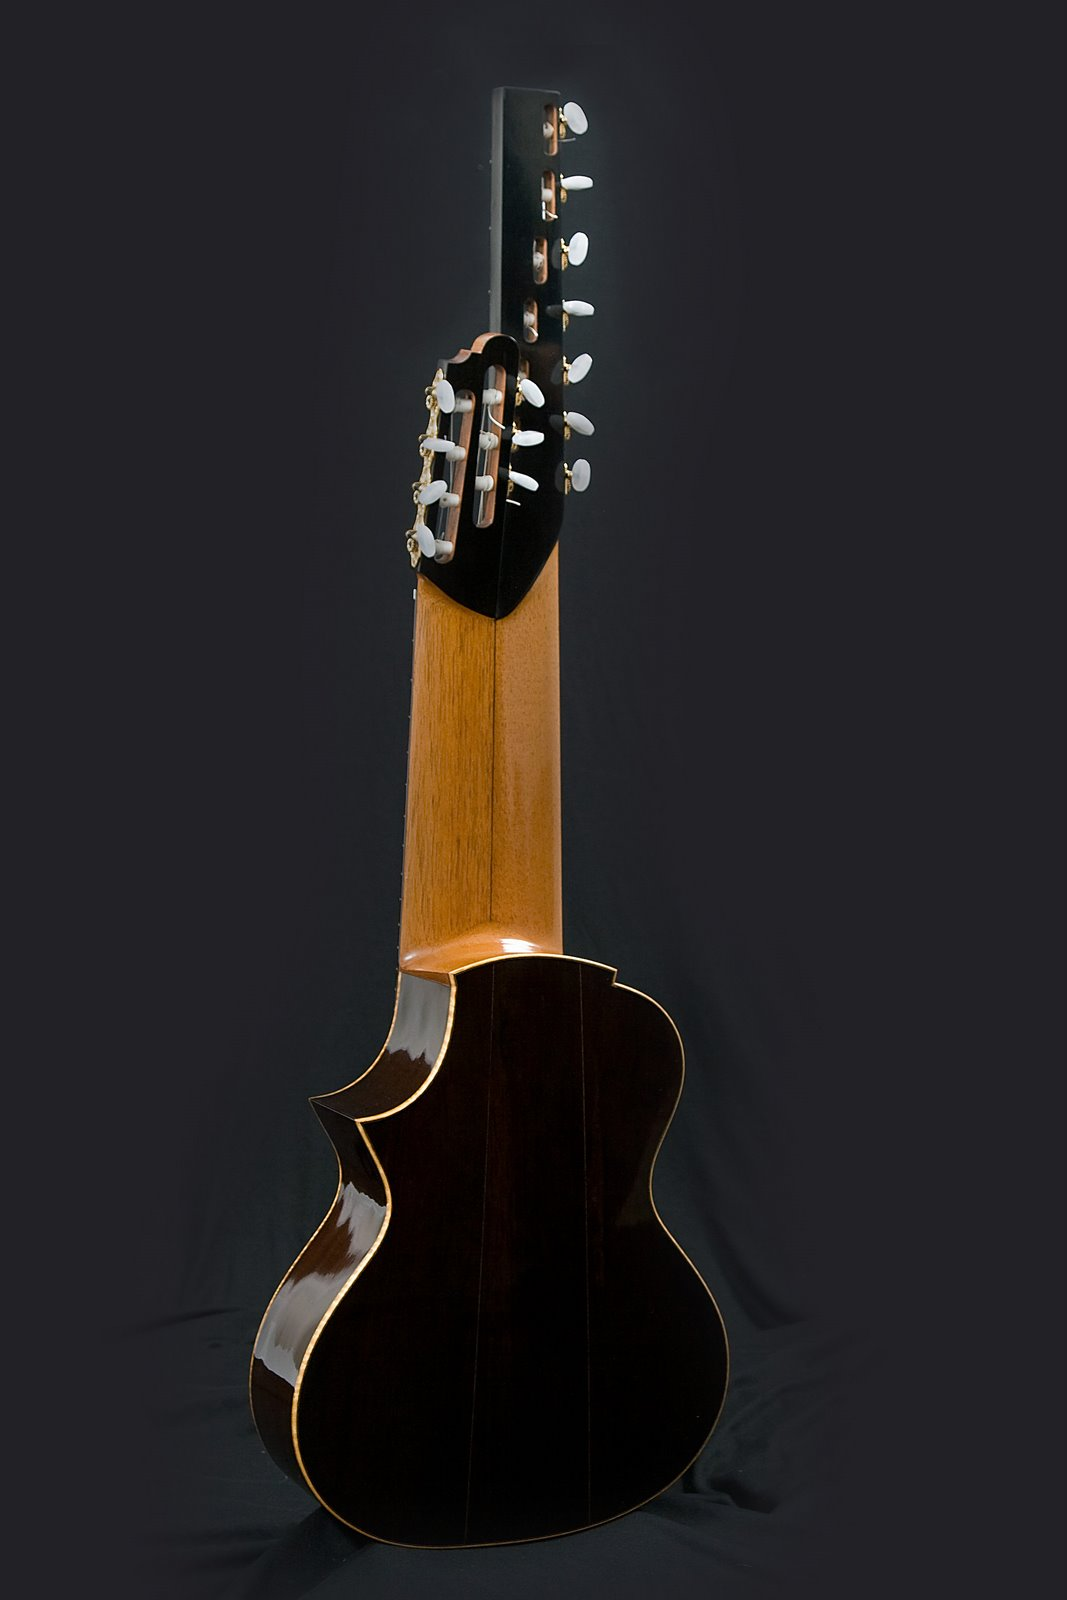 guitarras custom constru das por rodolfo cucculelli luthier 14 string terz guitar altgitarr. Black Bedroom Furniture Sets. Home Design Ideas